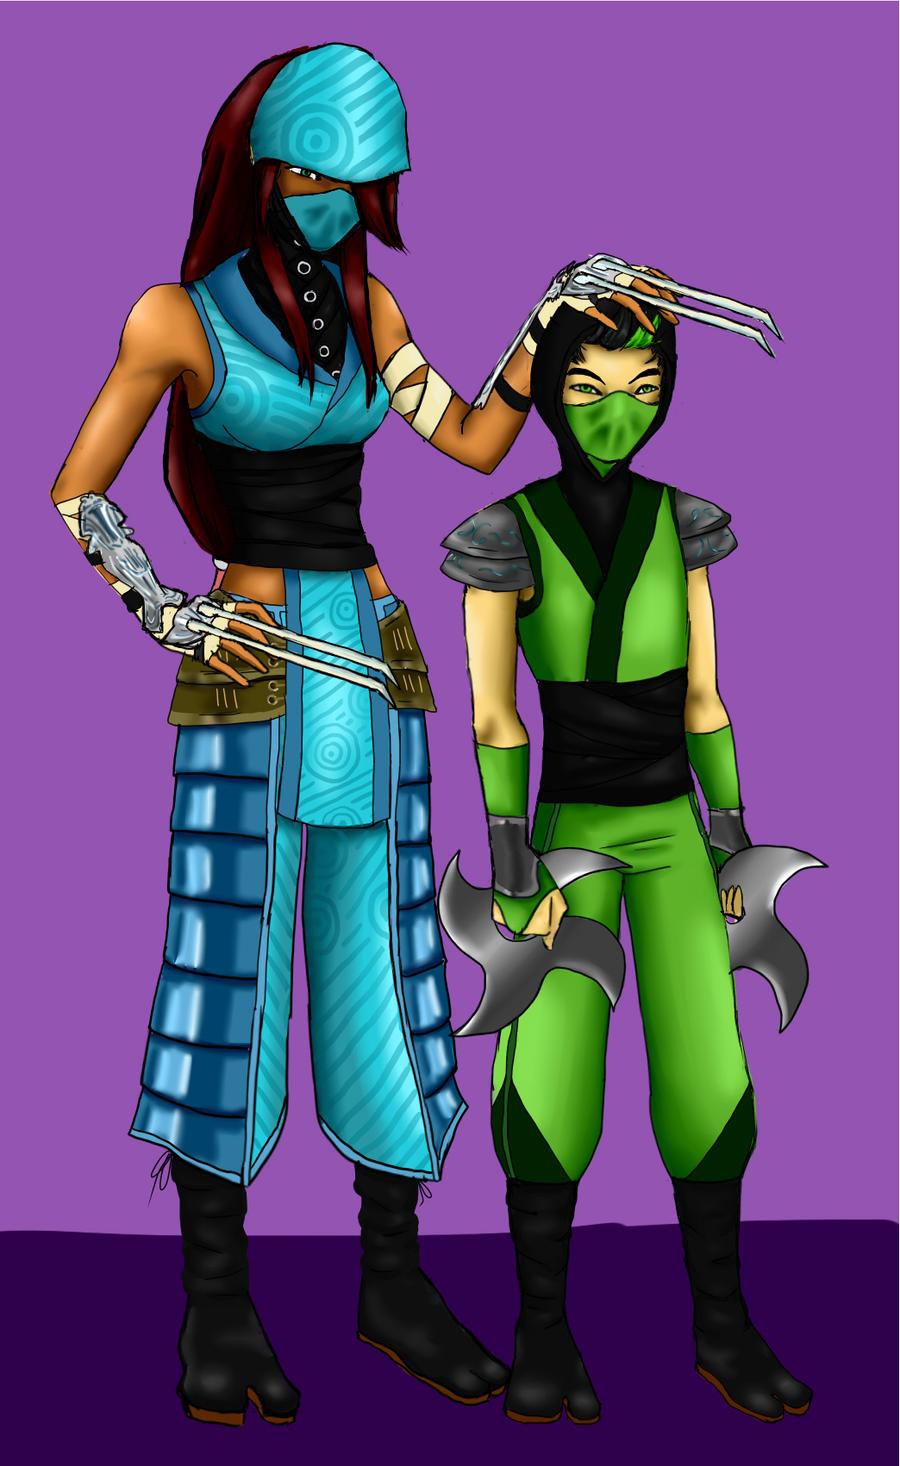 Ninja Protege by artistic18